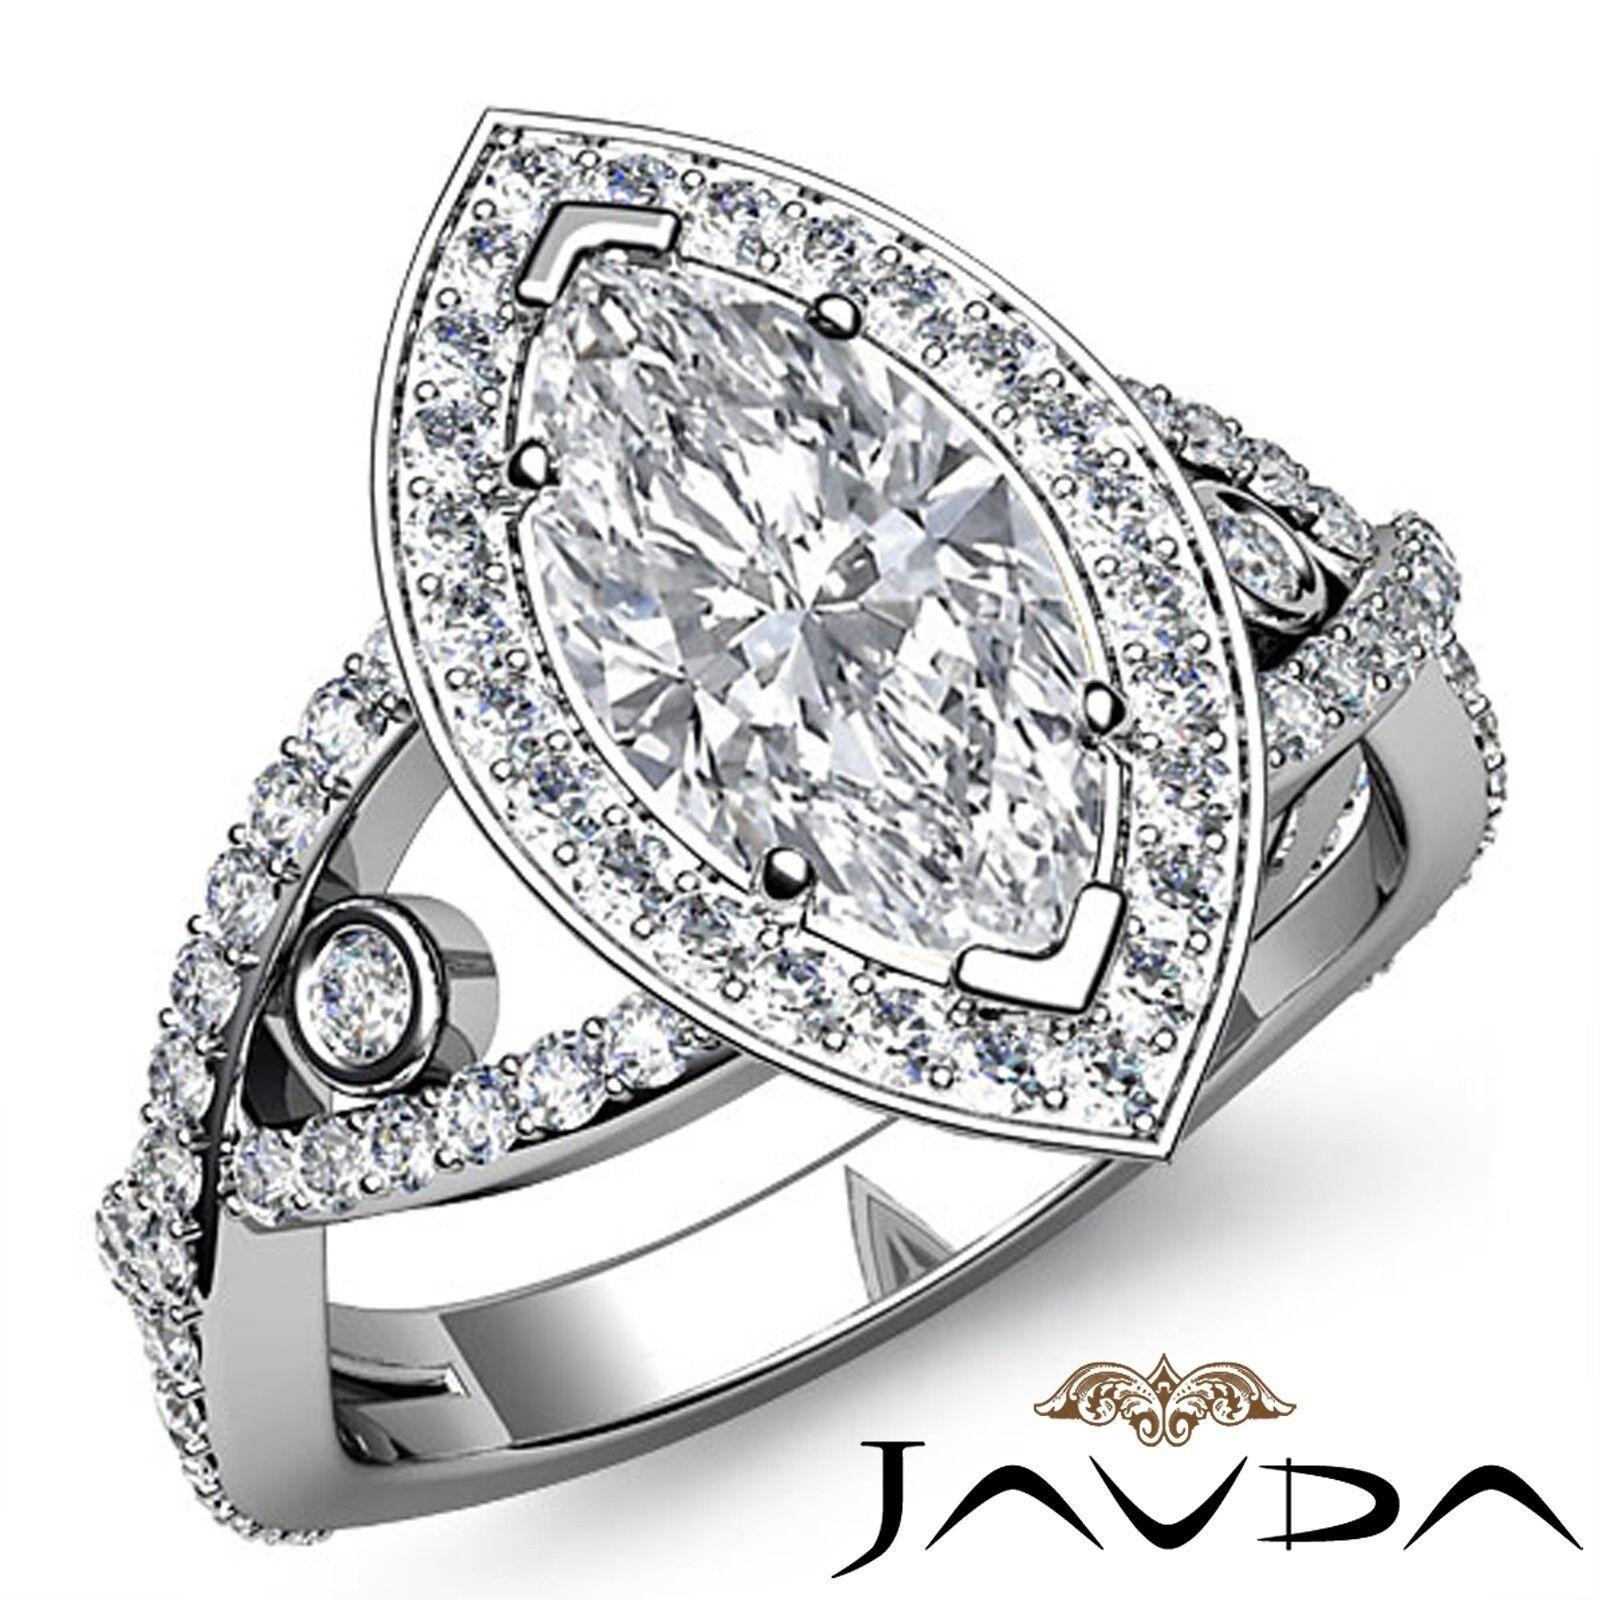 2.66ctw Cross Shank Circa Halo Marquise Diamond Engagement Ring GIA J-VS2 W Gold